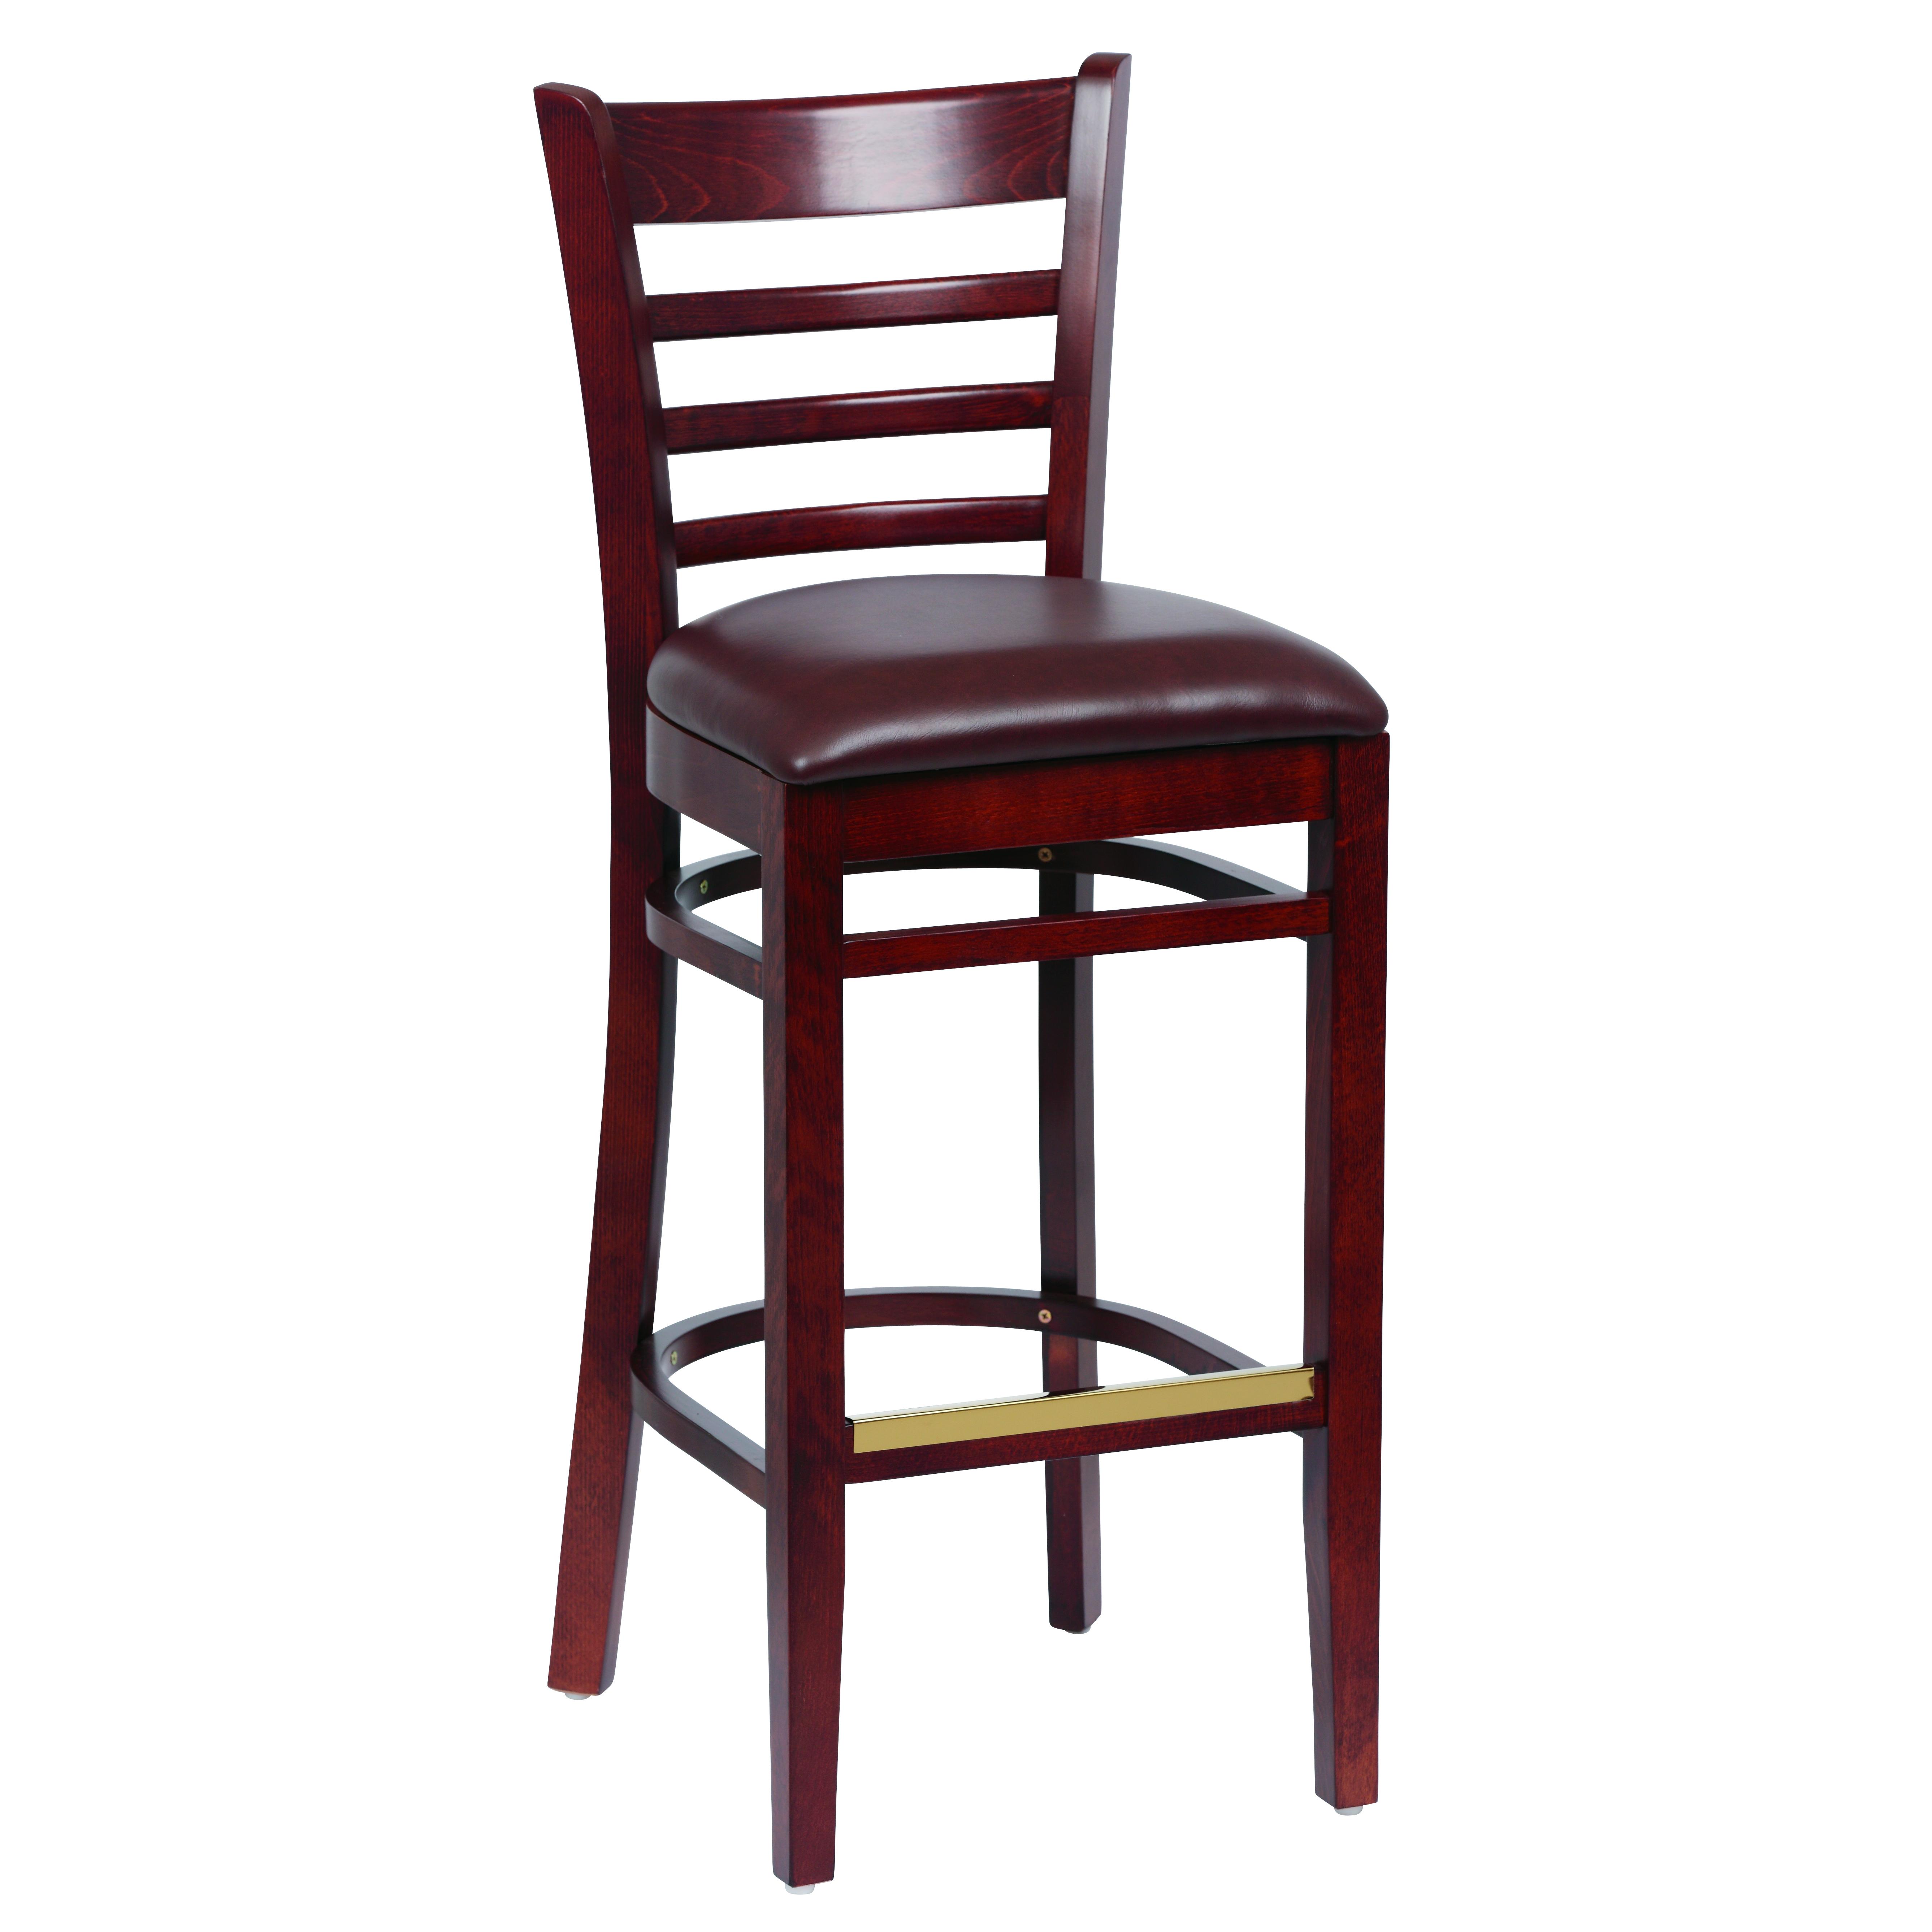 Royal Industries ROY 8002 W BRN bar stool, indoor